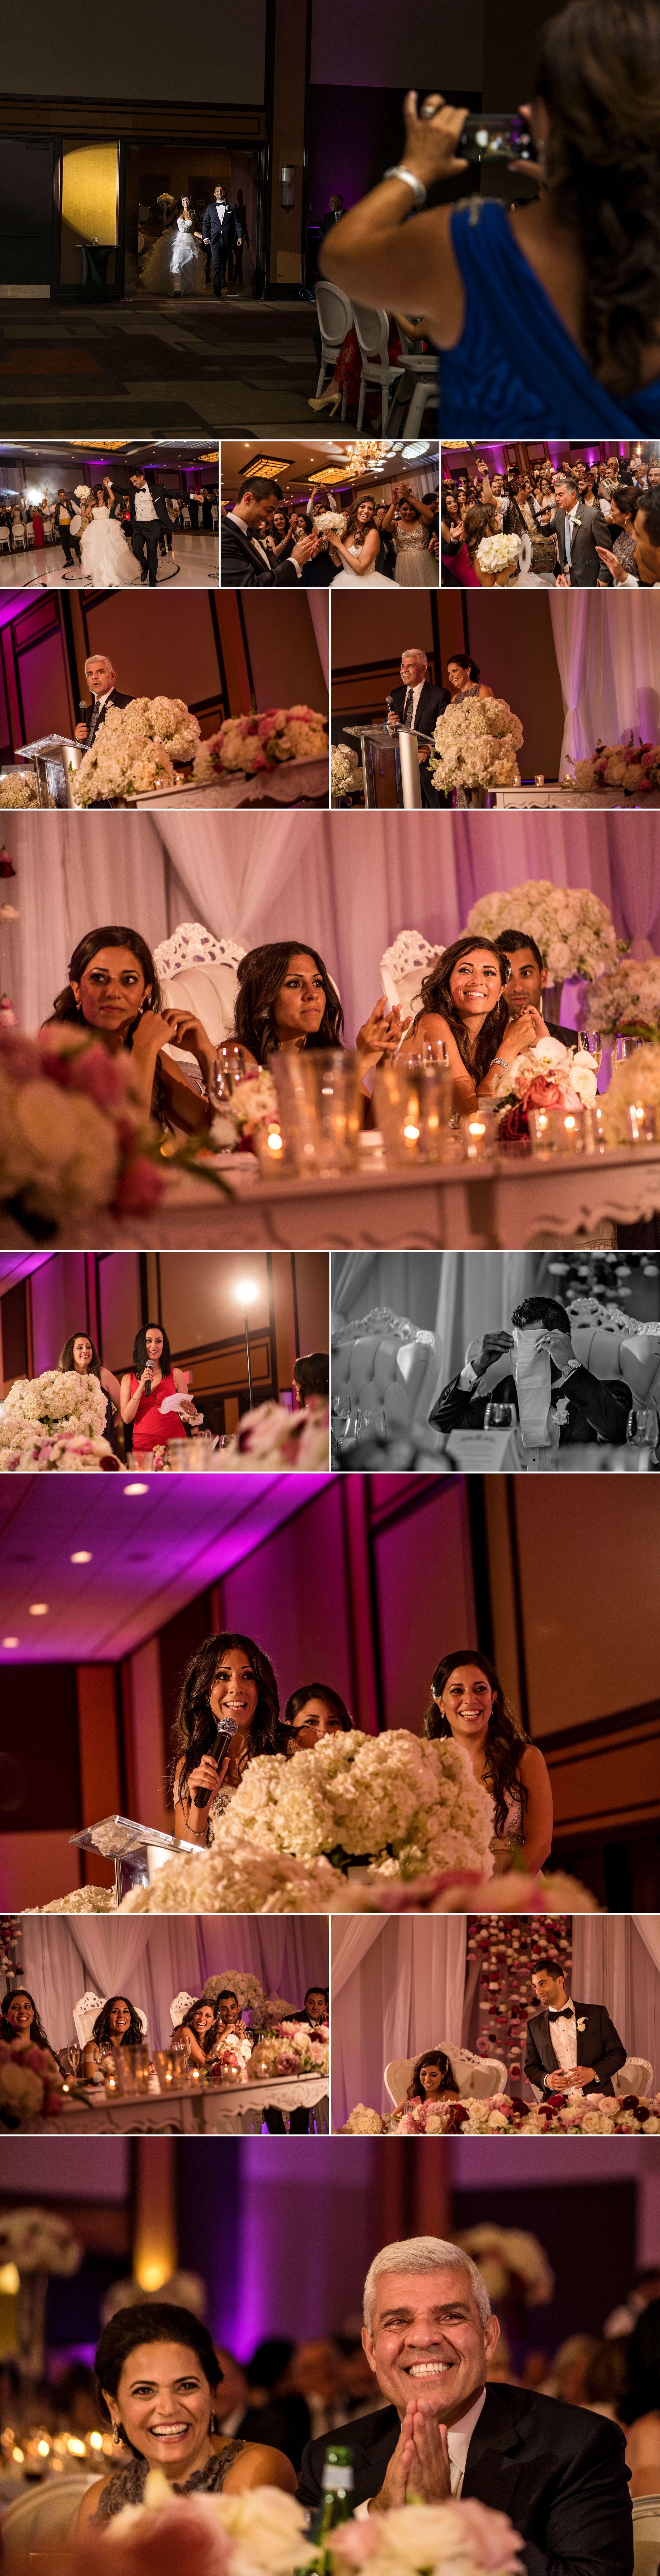 Wedding reception photographs at the Hilton Lac Lemy